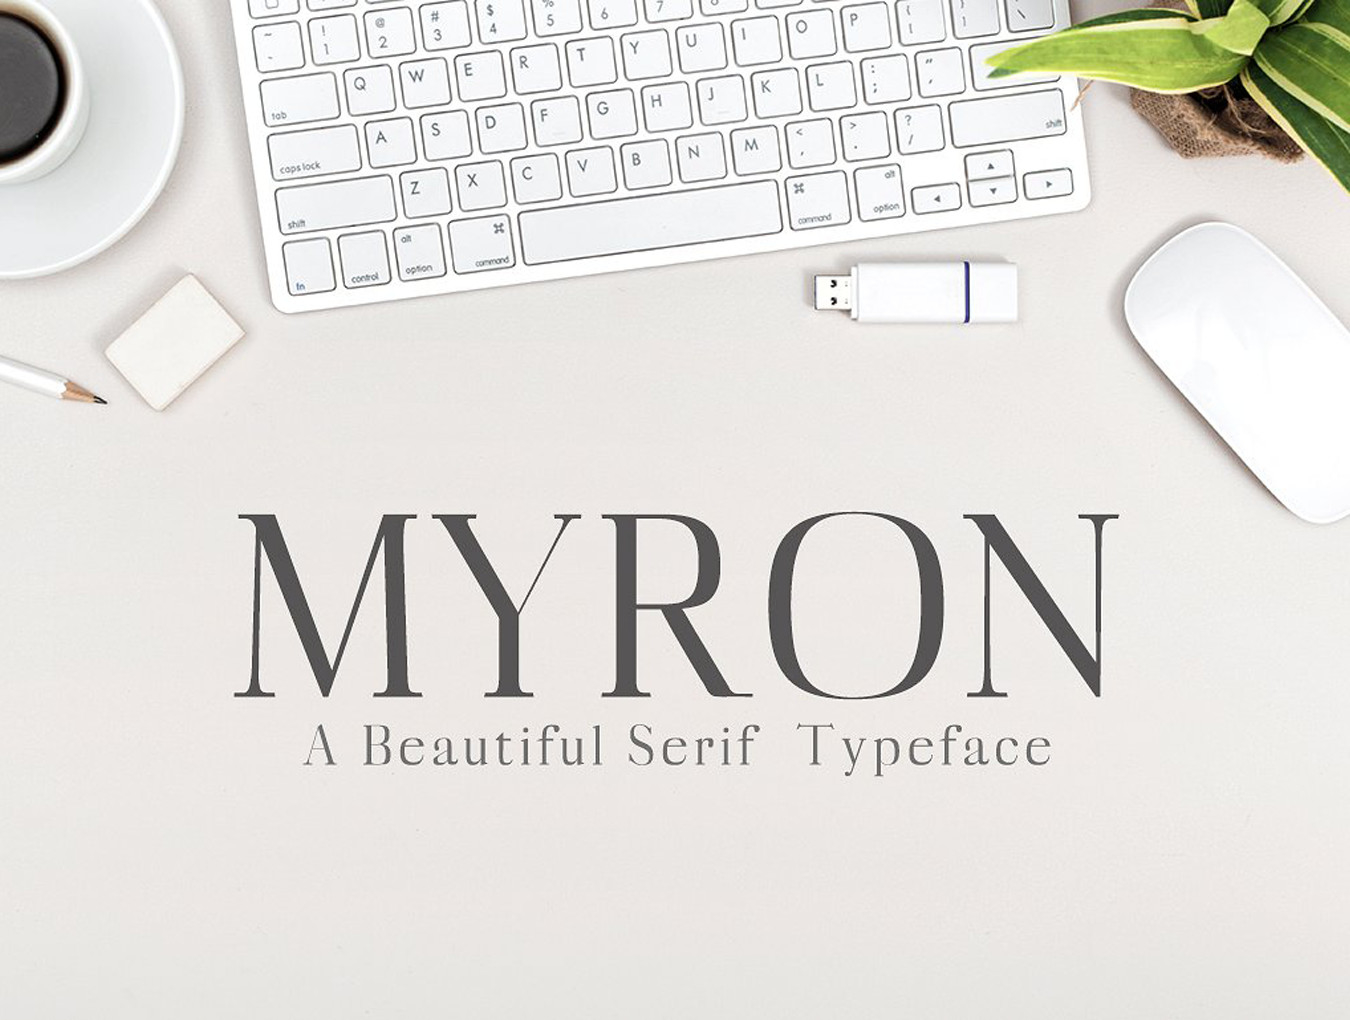 Myron Serif Typeface — Fonts on UI8